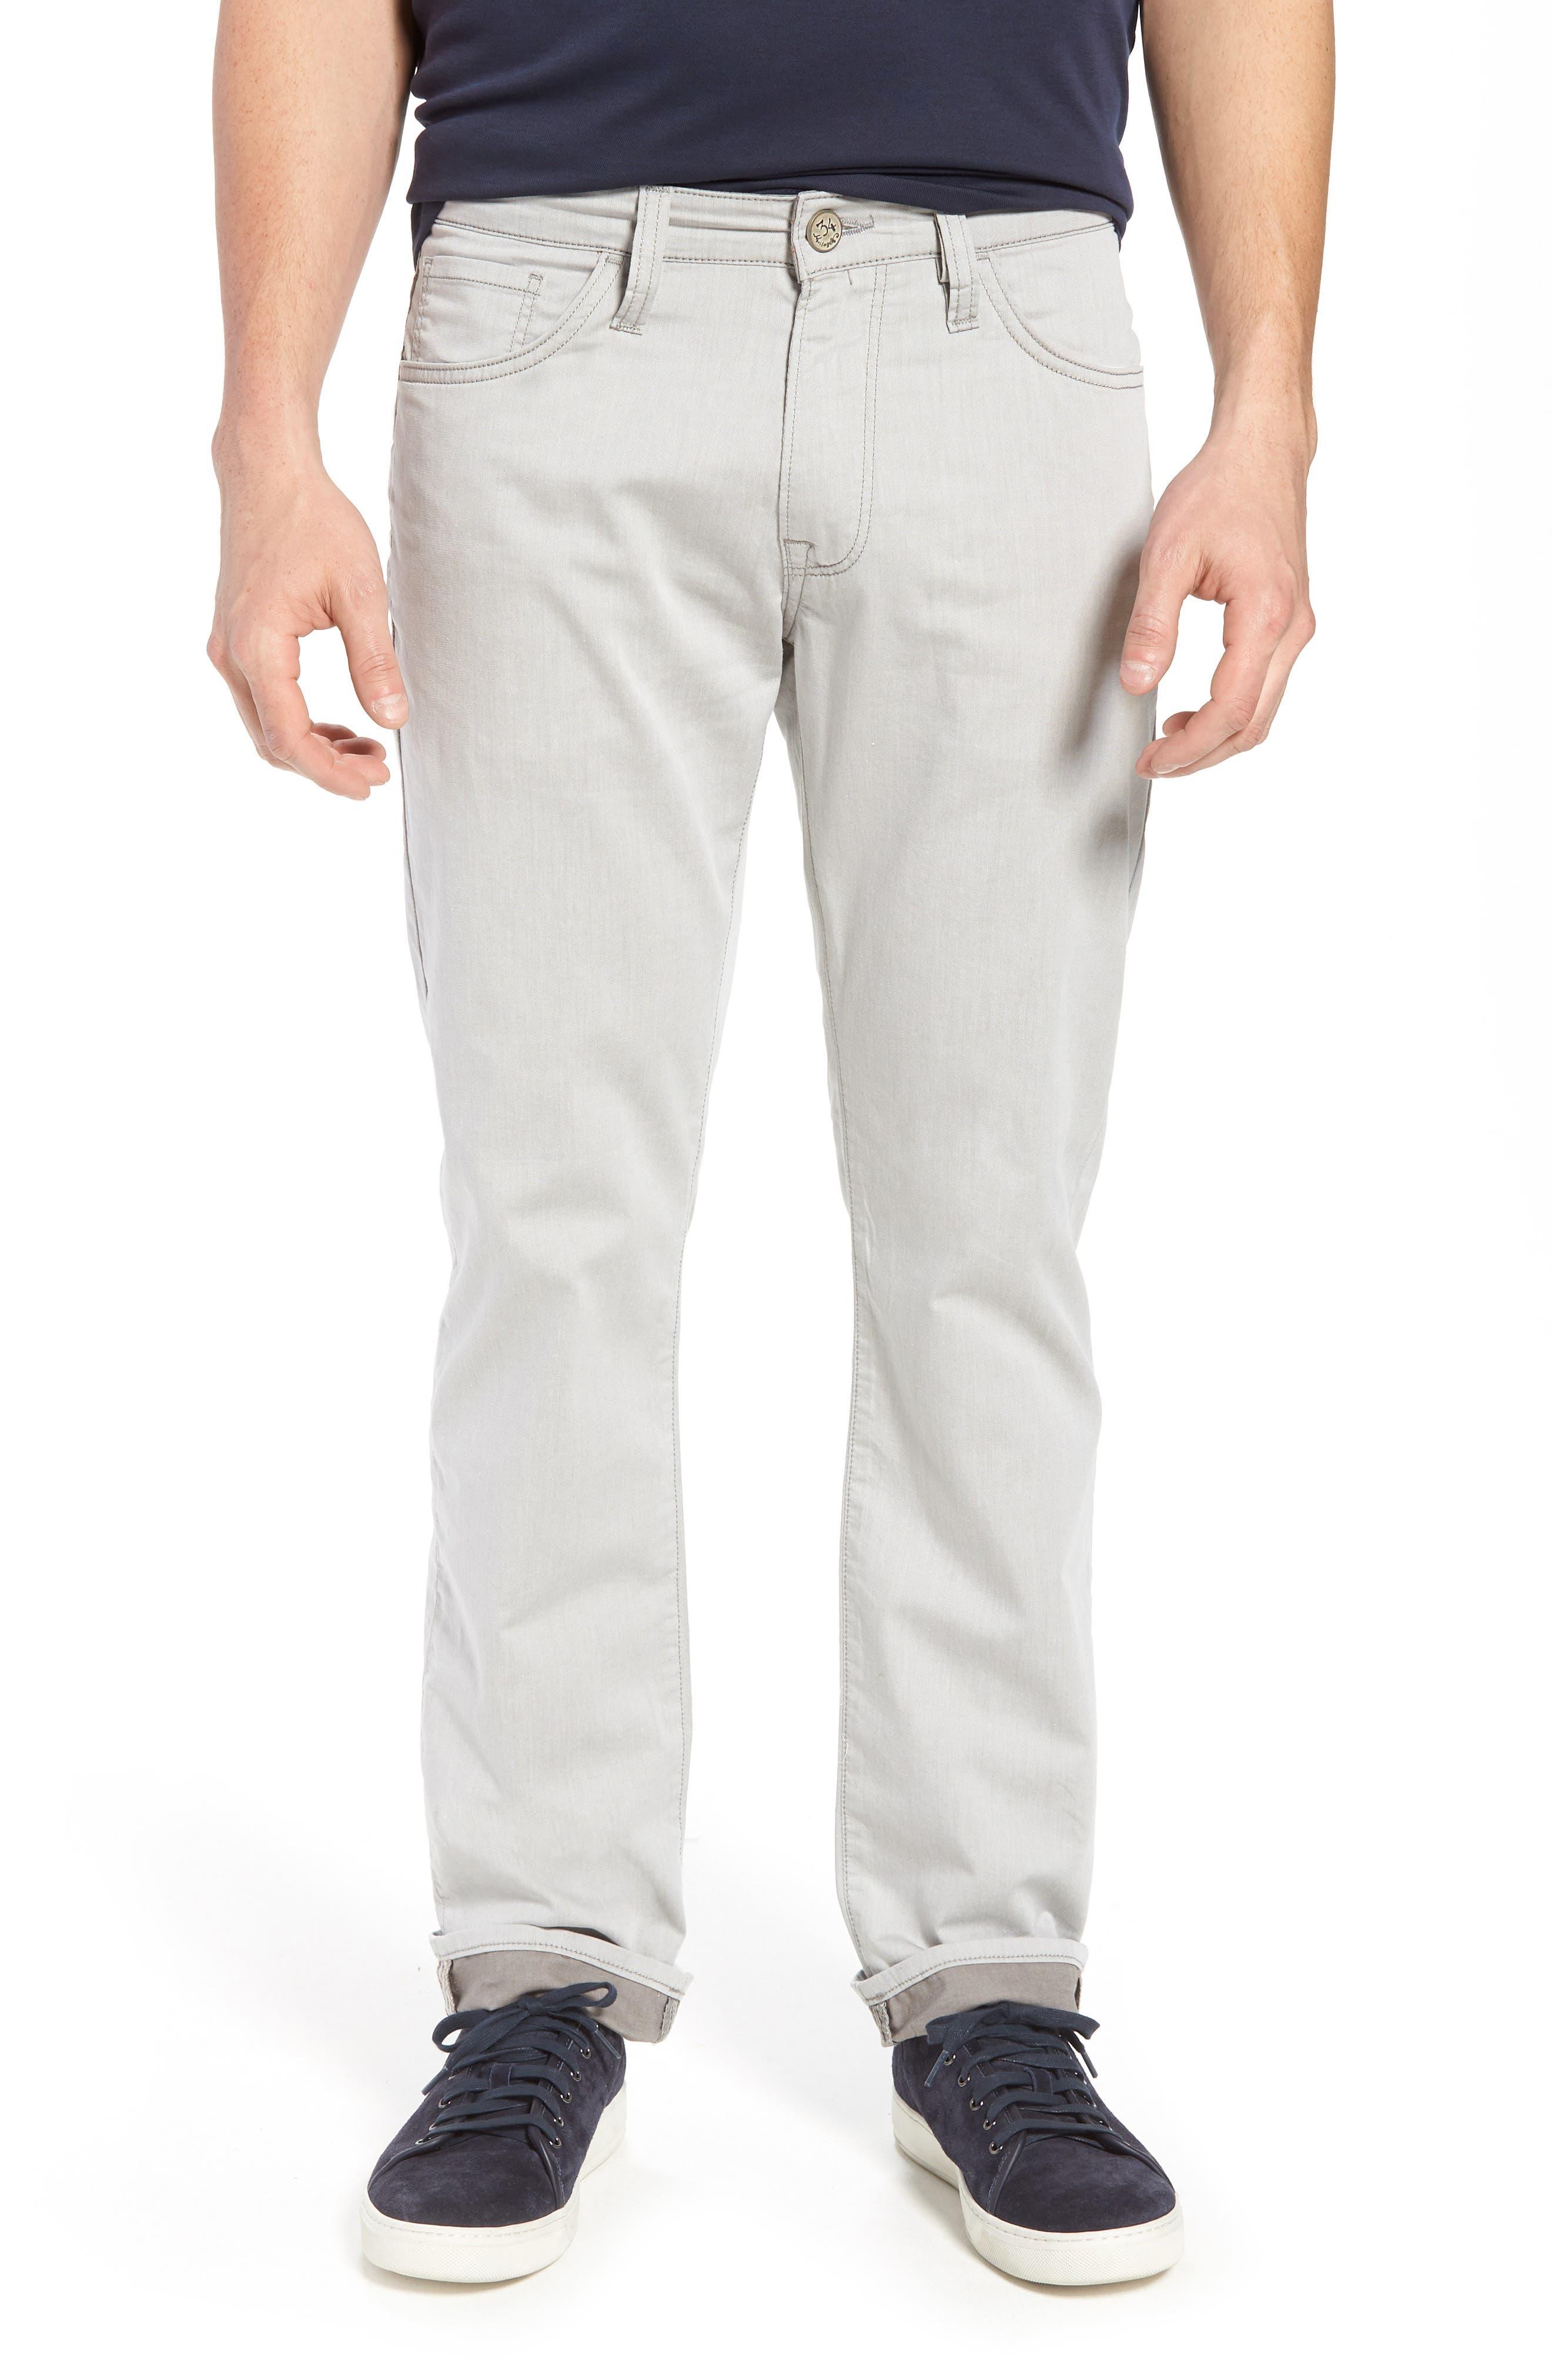 Courage Straight Leg Jeans,                             Main thumbnail 1, color,                             Latte Herringbone Reversed